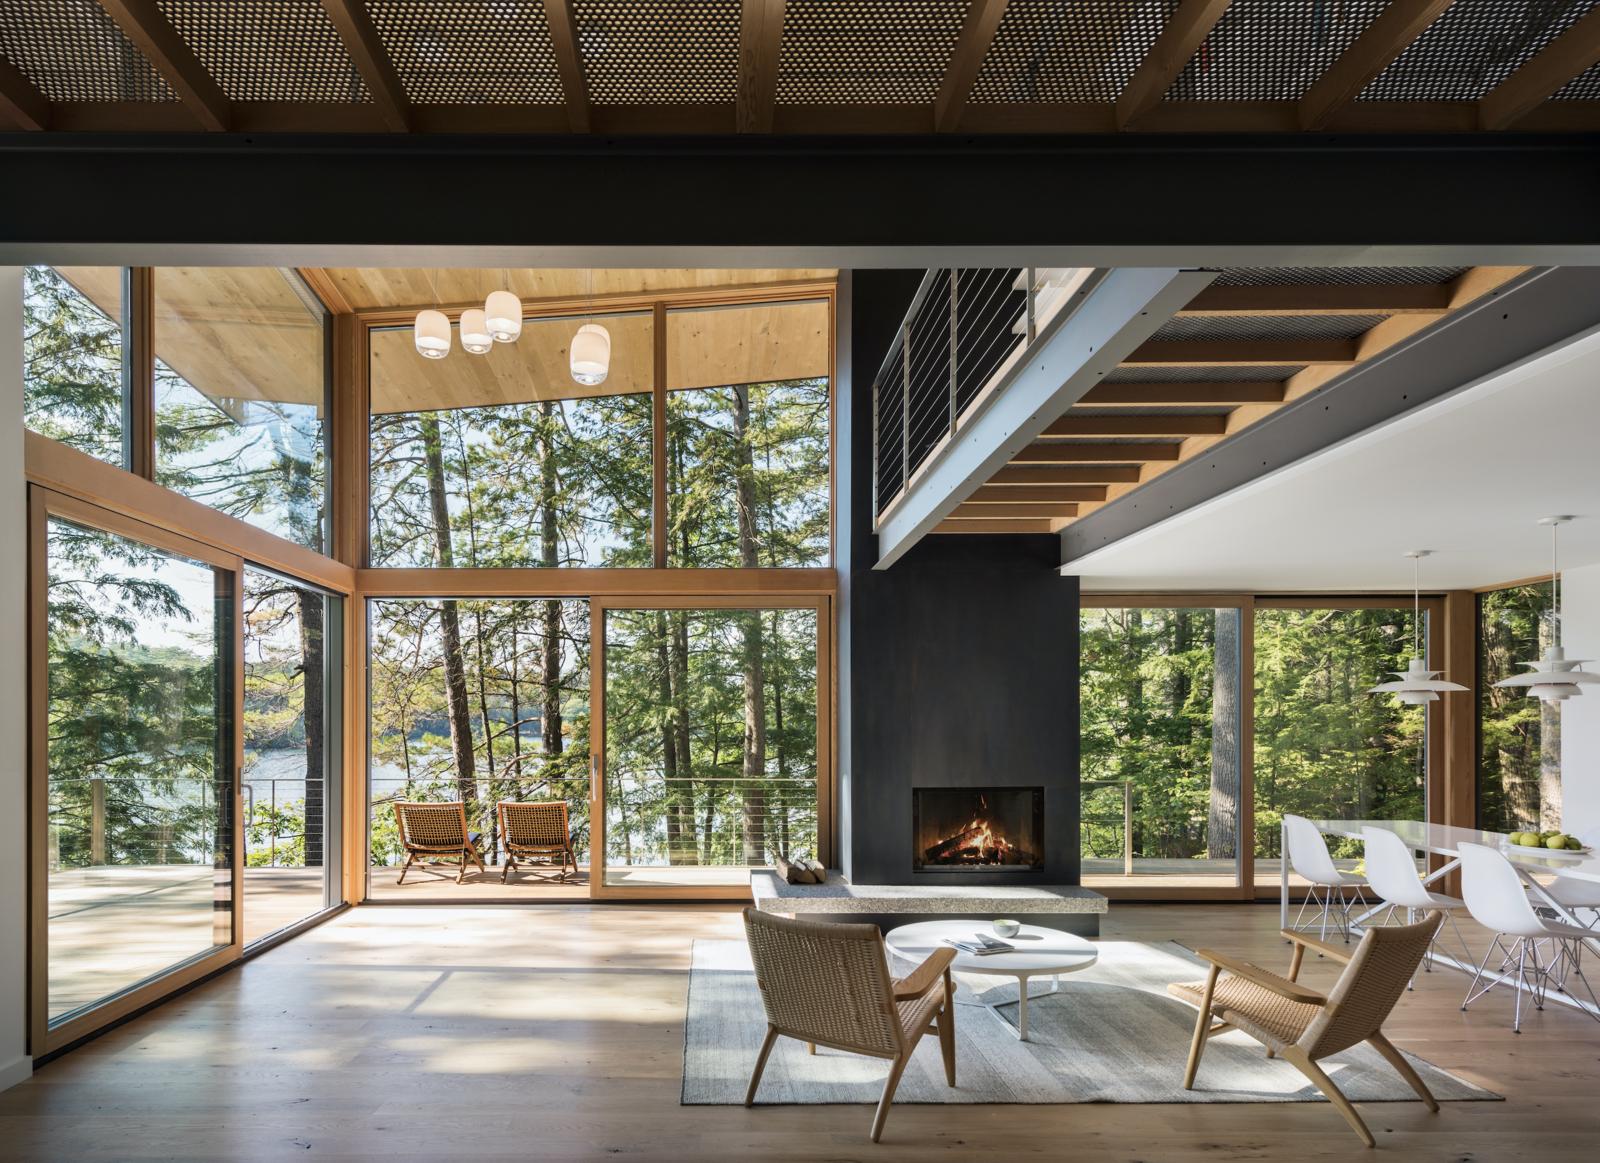 Seamless indoor/outdoor living allows a family to unplug ... on Seamless Indoor Outdoor Living id=22323